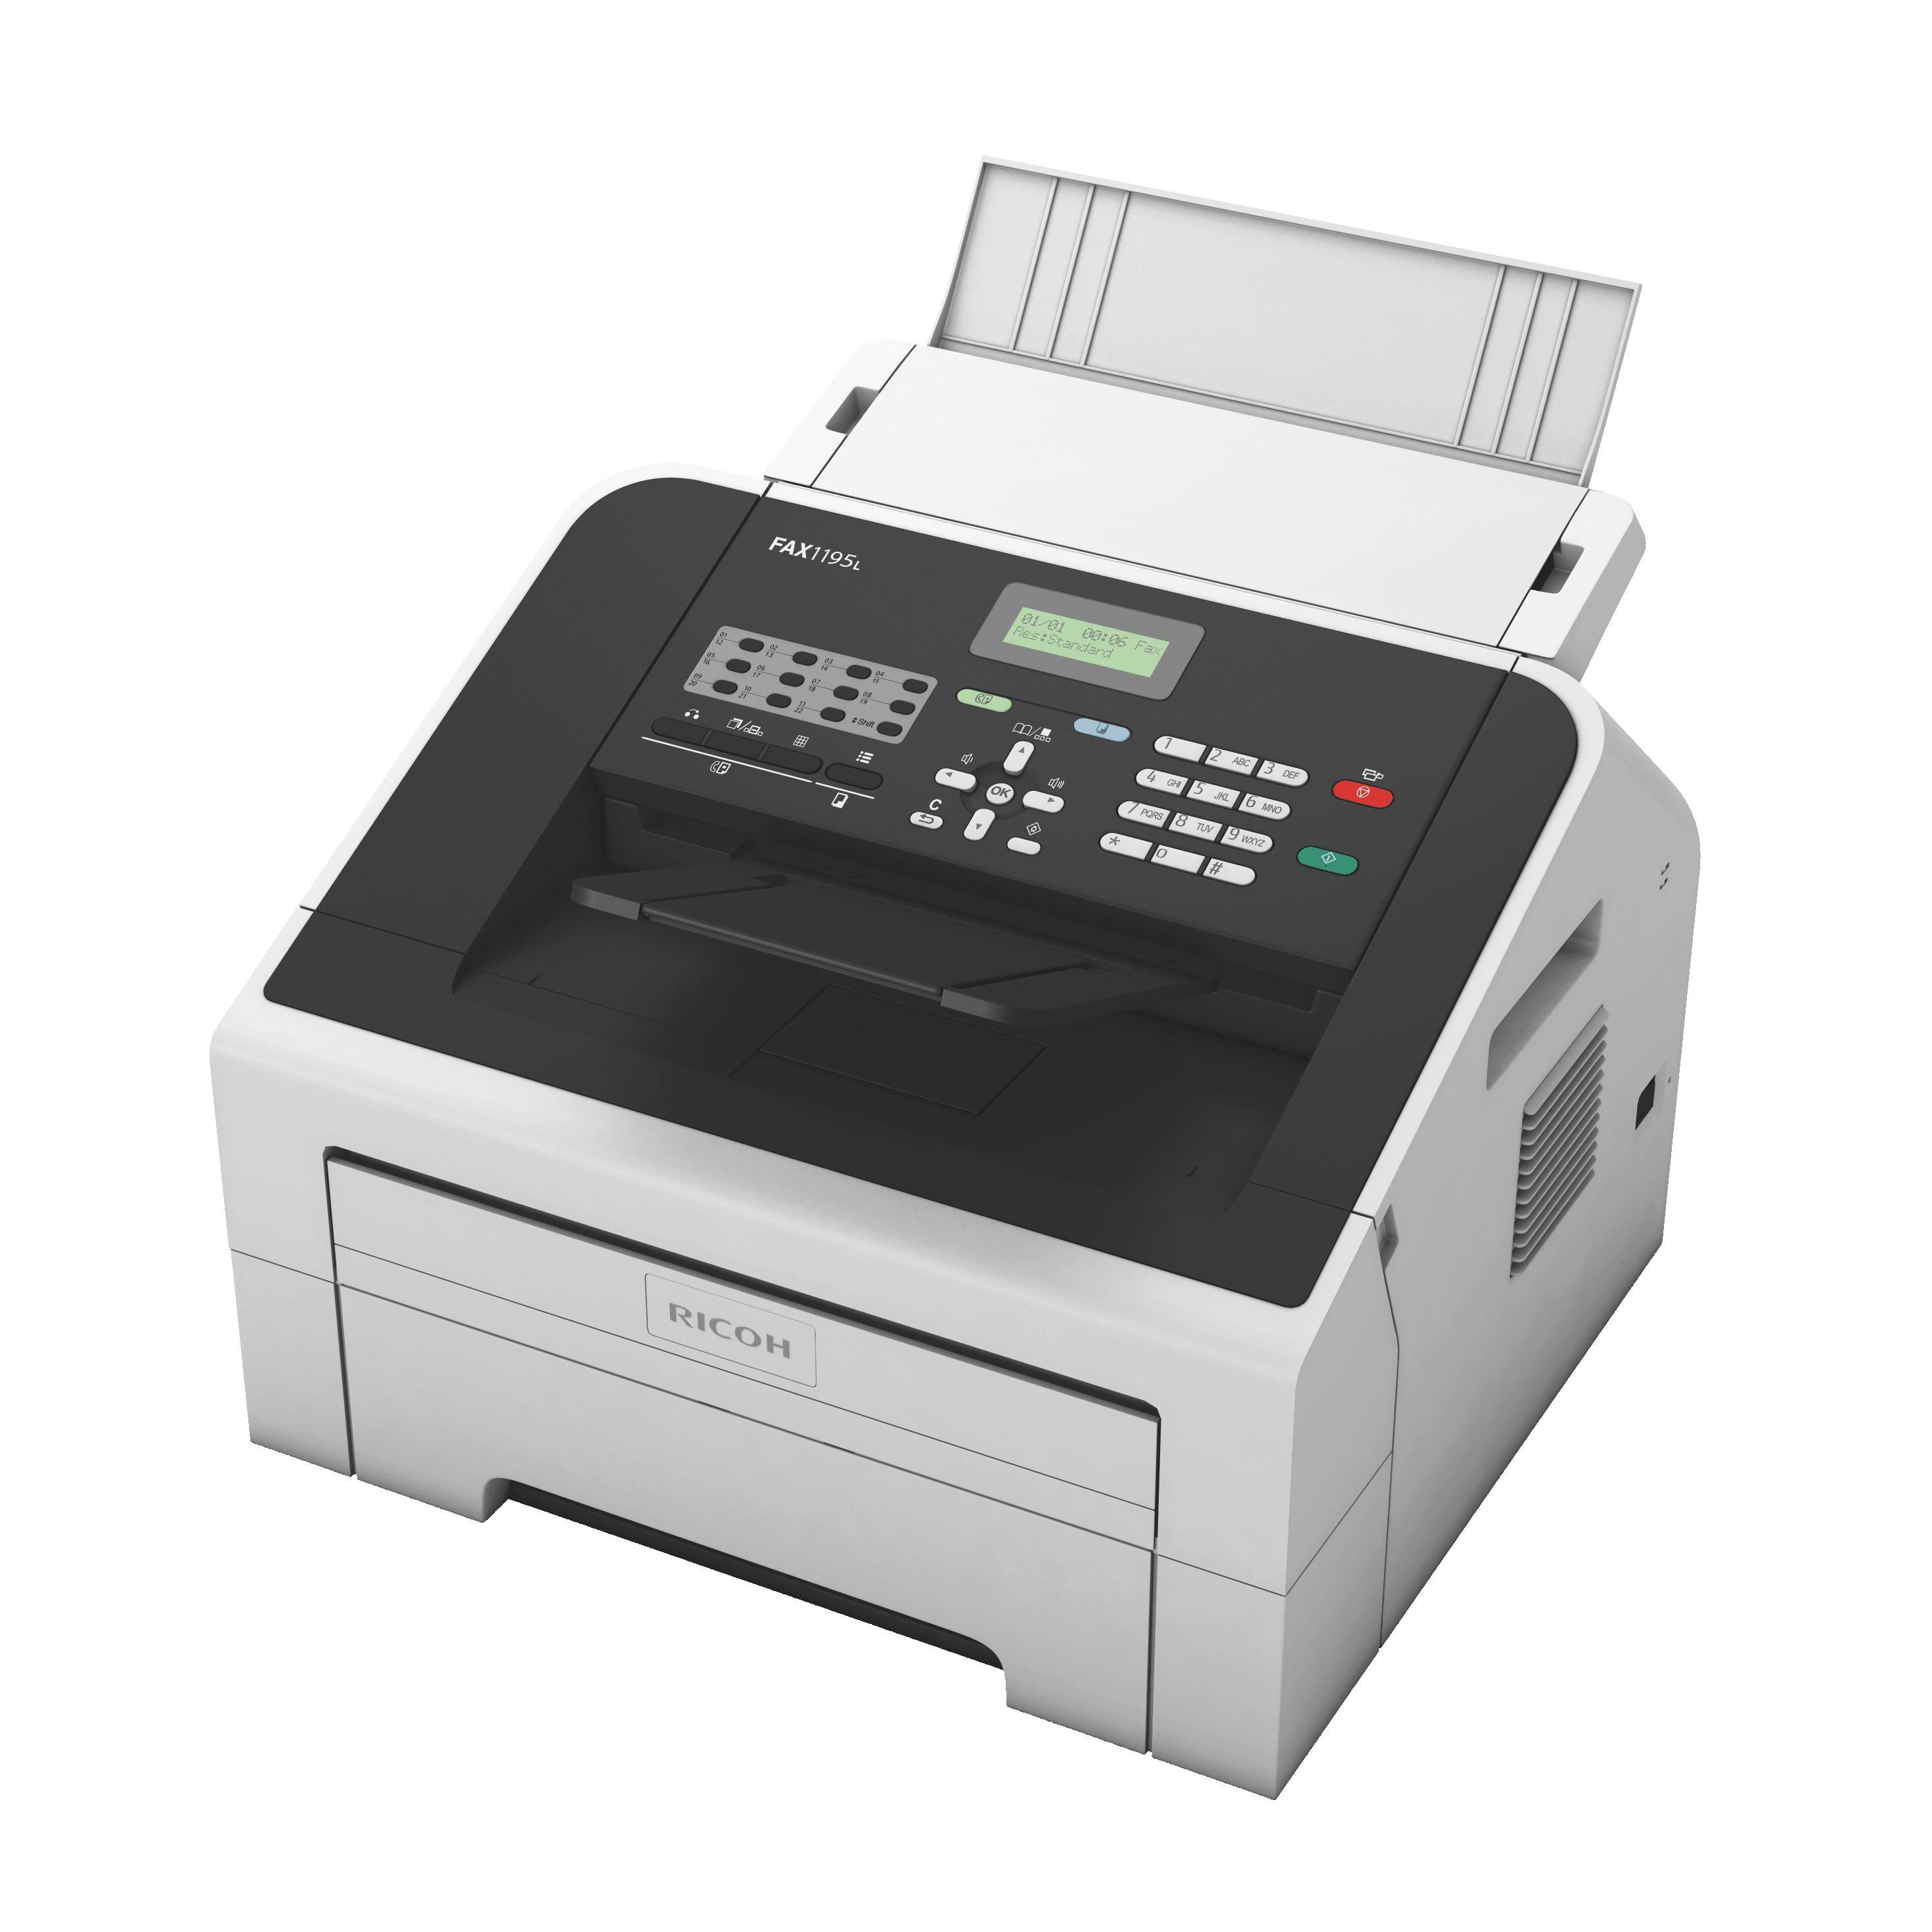 Ricoh Aficio Laserfax 1195L